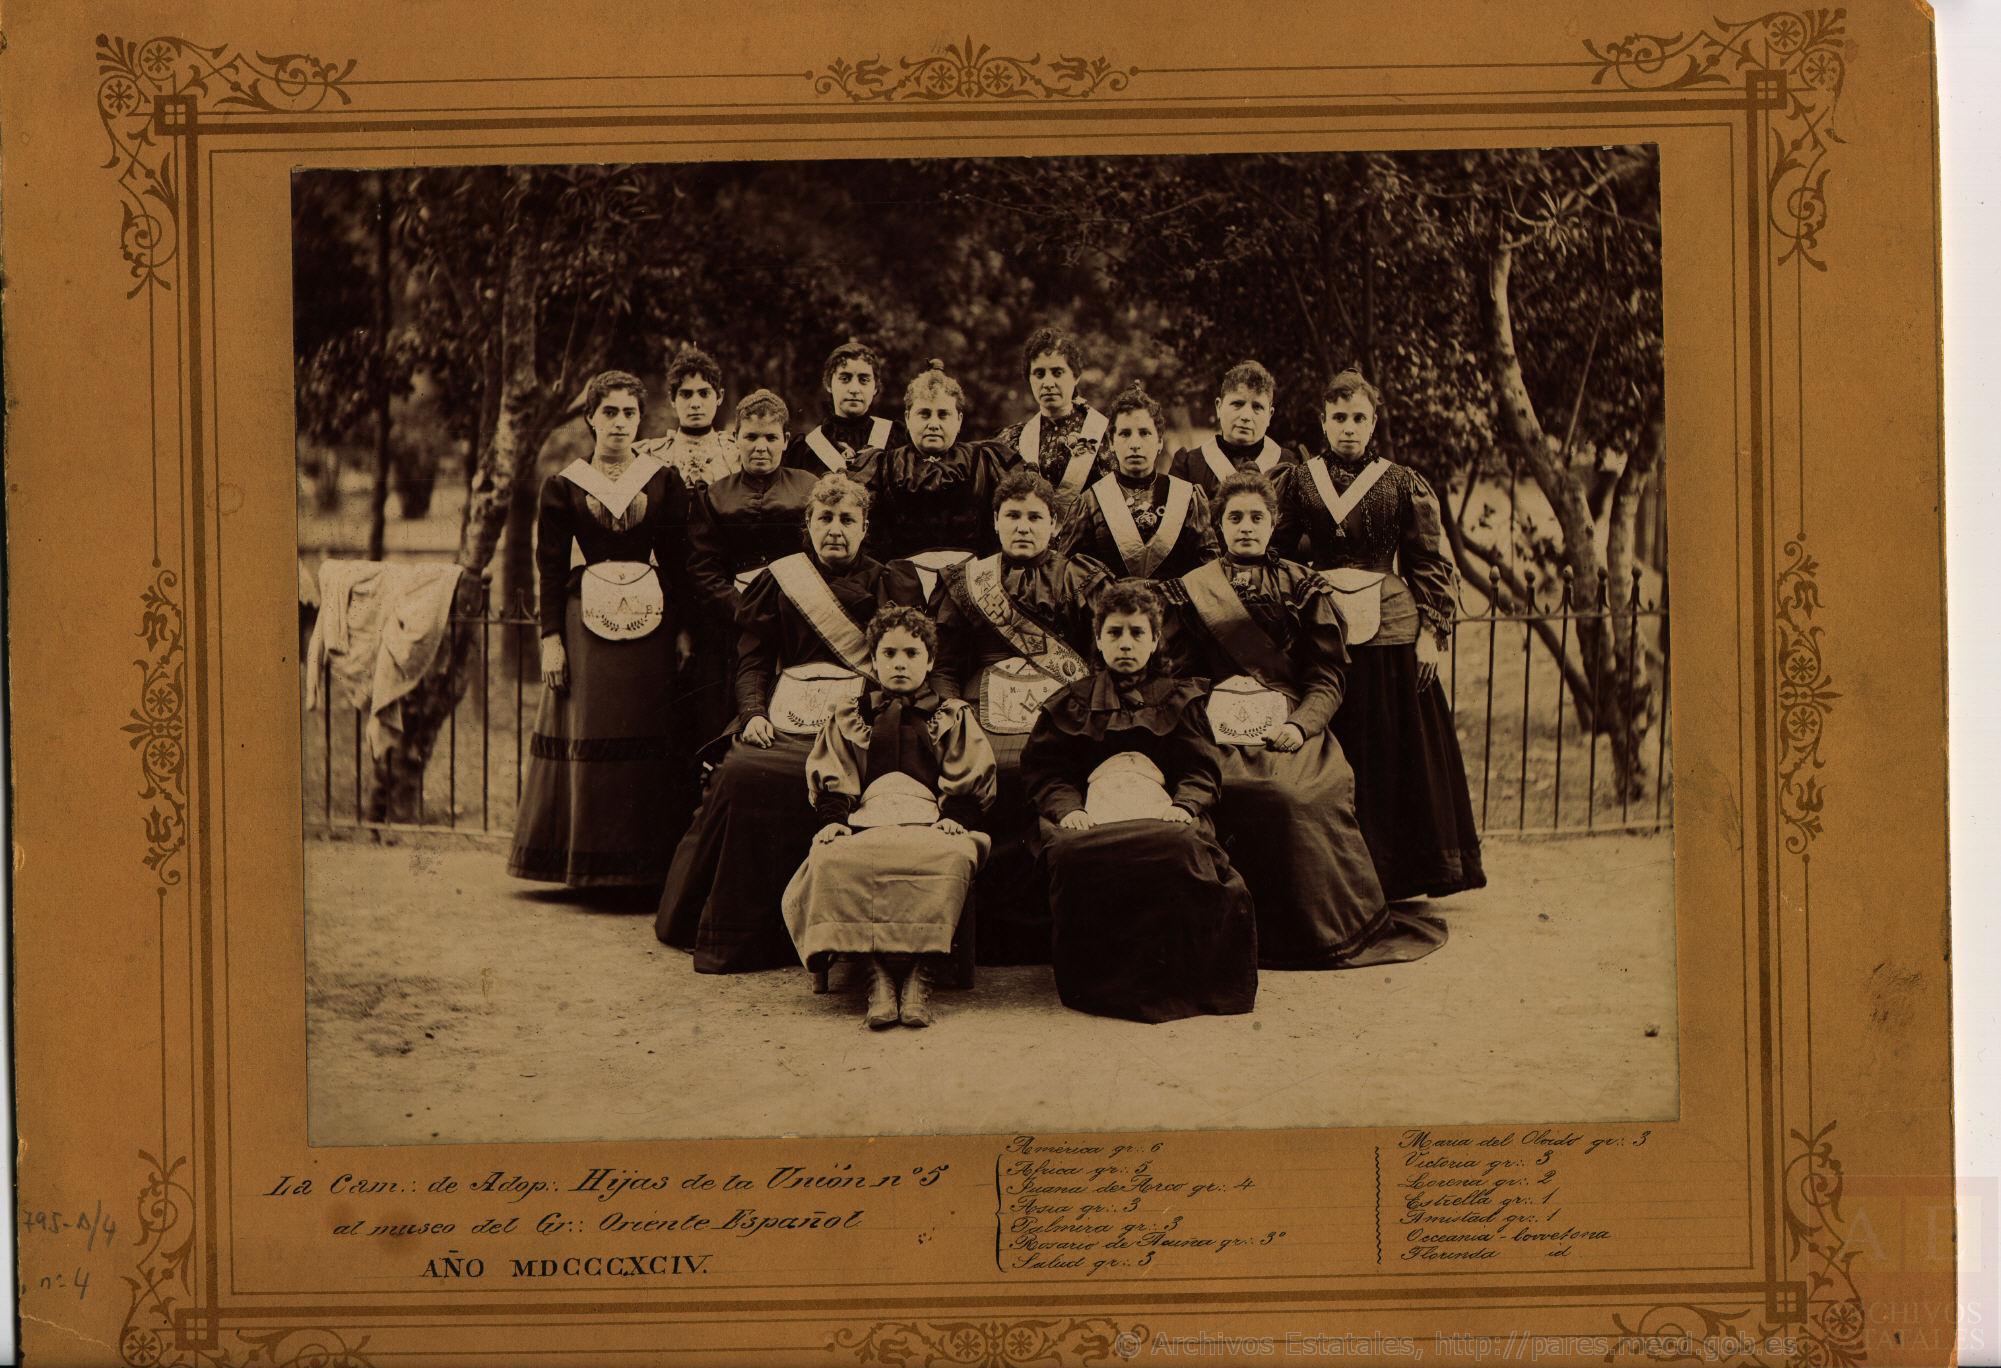 Logia Hijas de la Unión nº5